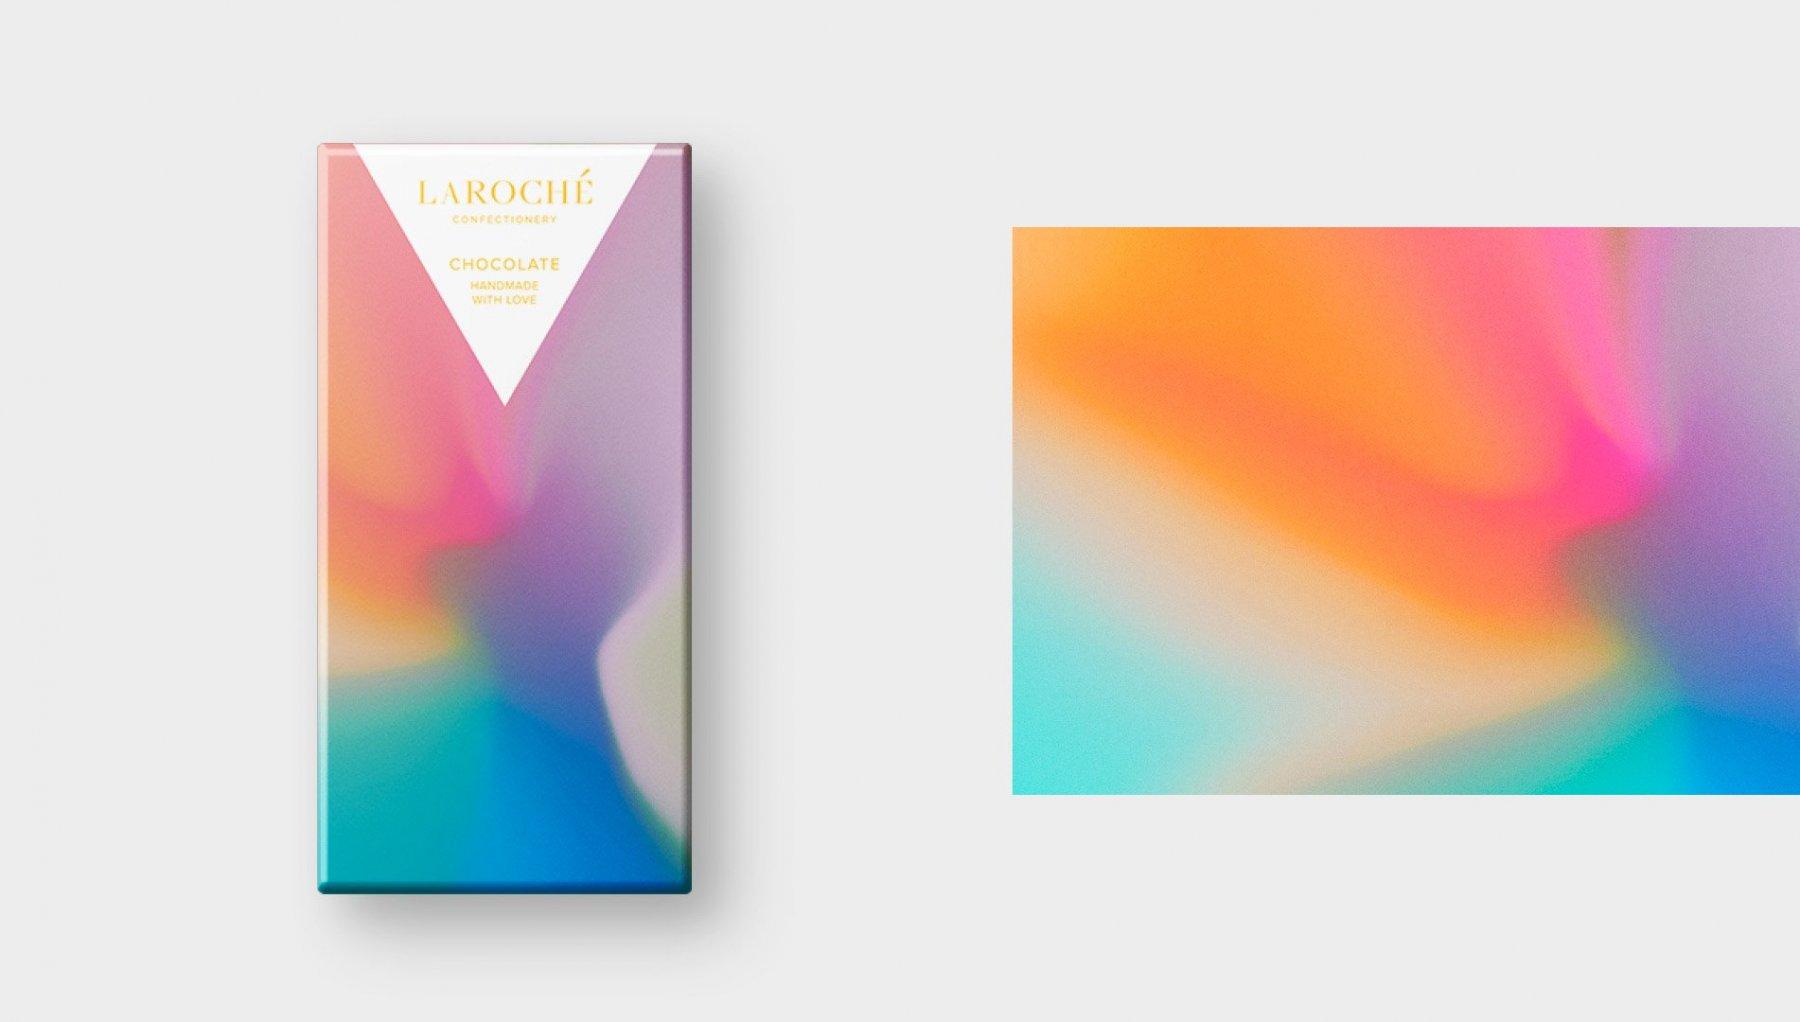 Laroche-Chocolate-Packaging-by-Martin-Naumann-05